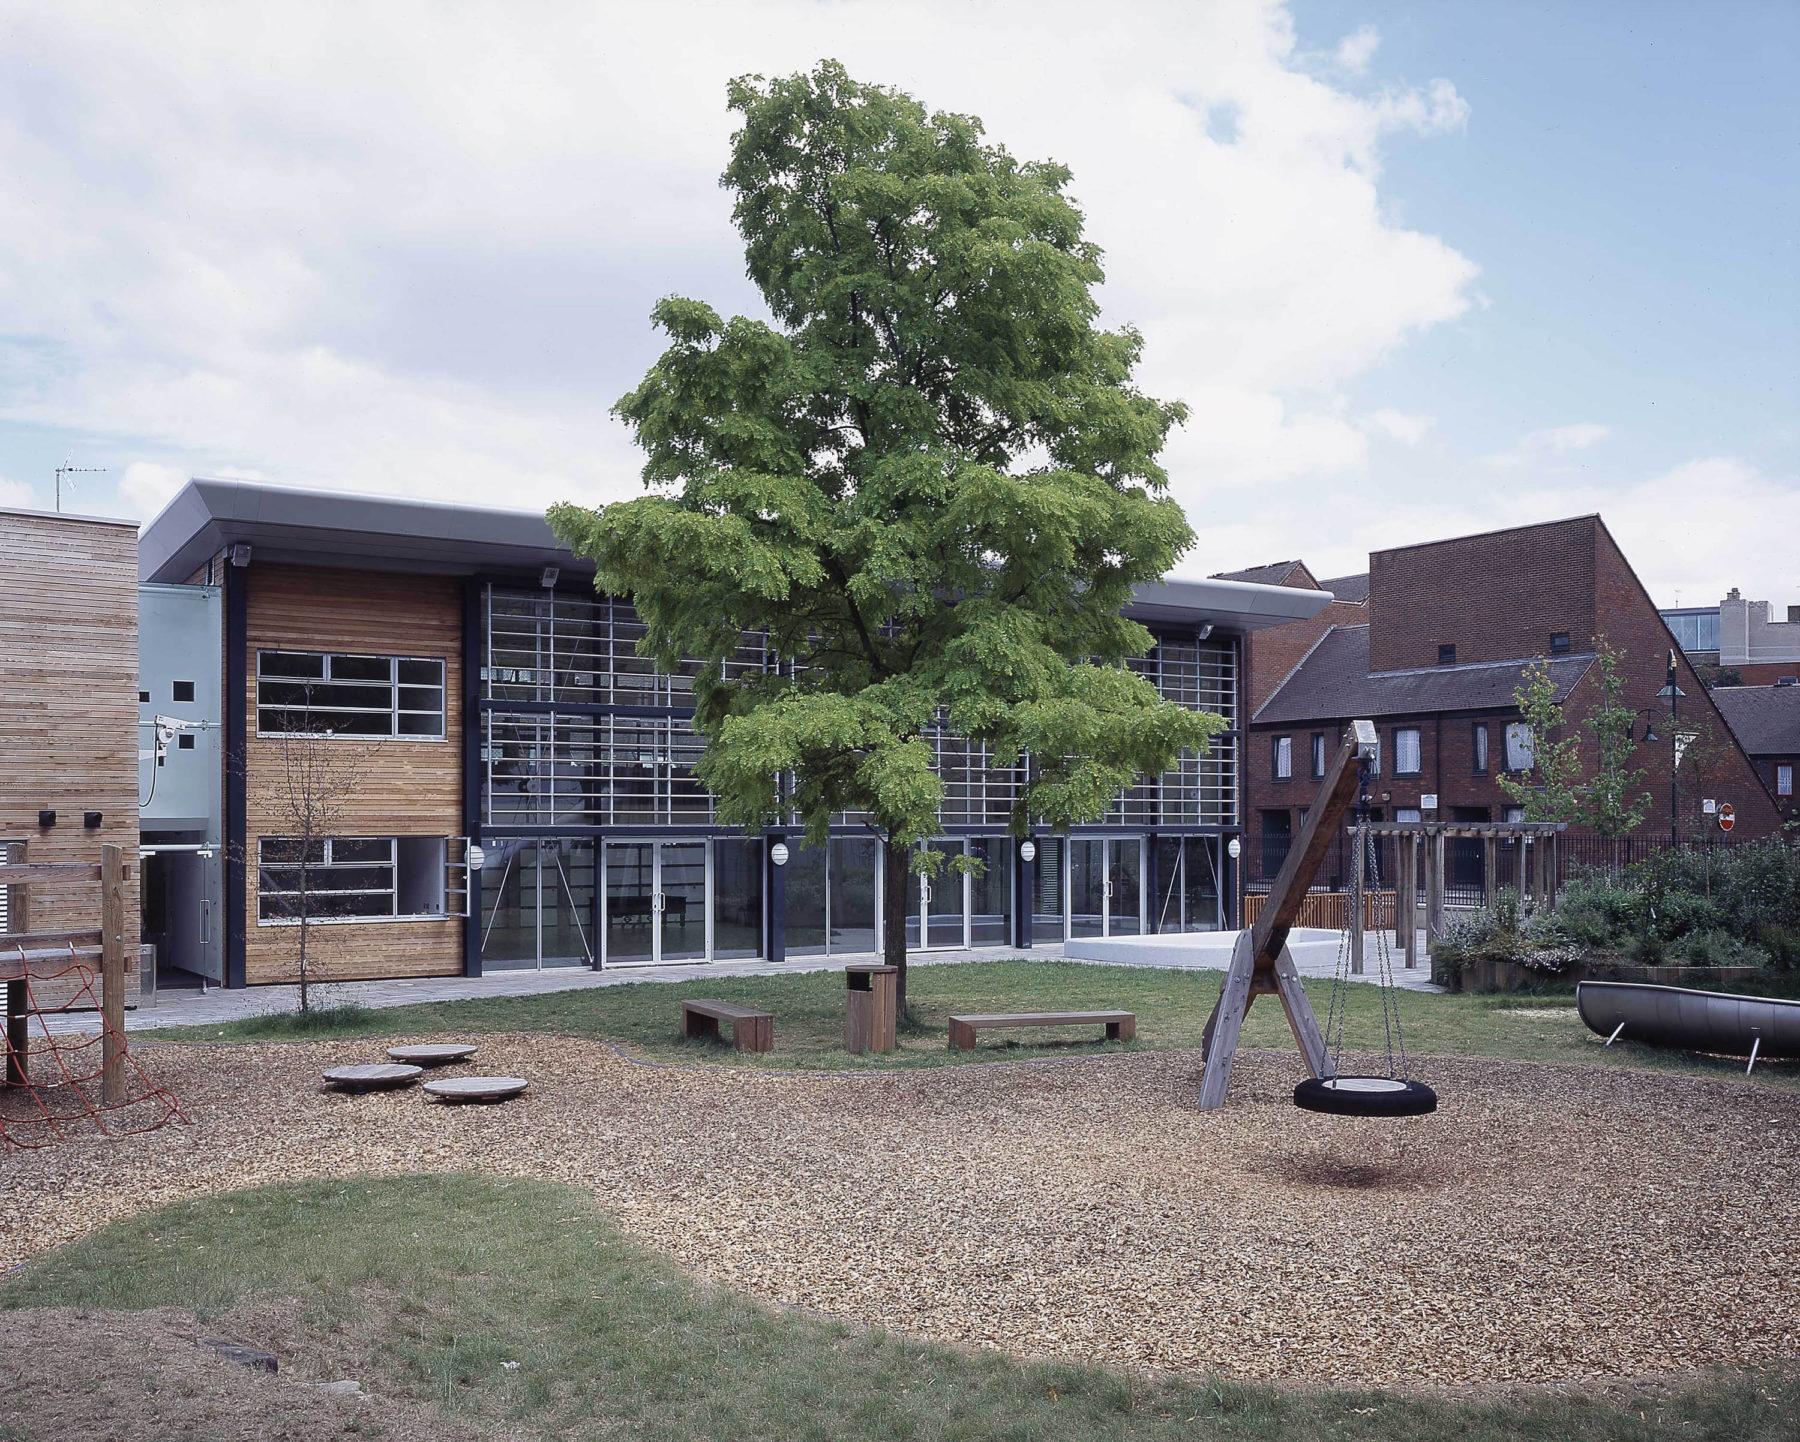 Attlee Community Centre 02 External Playground